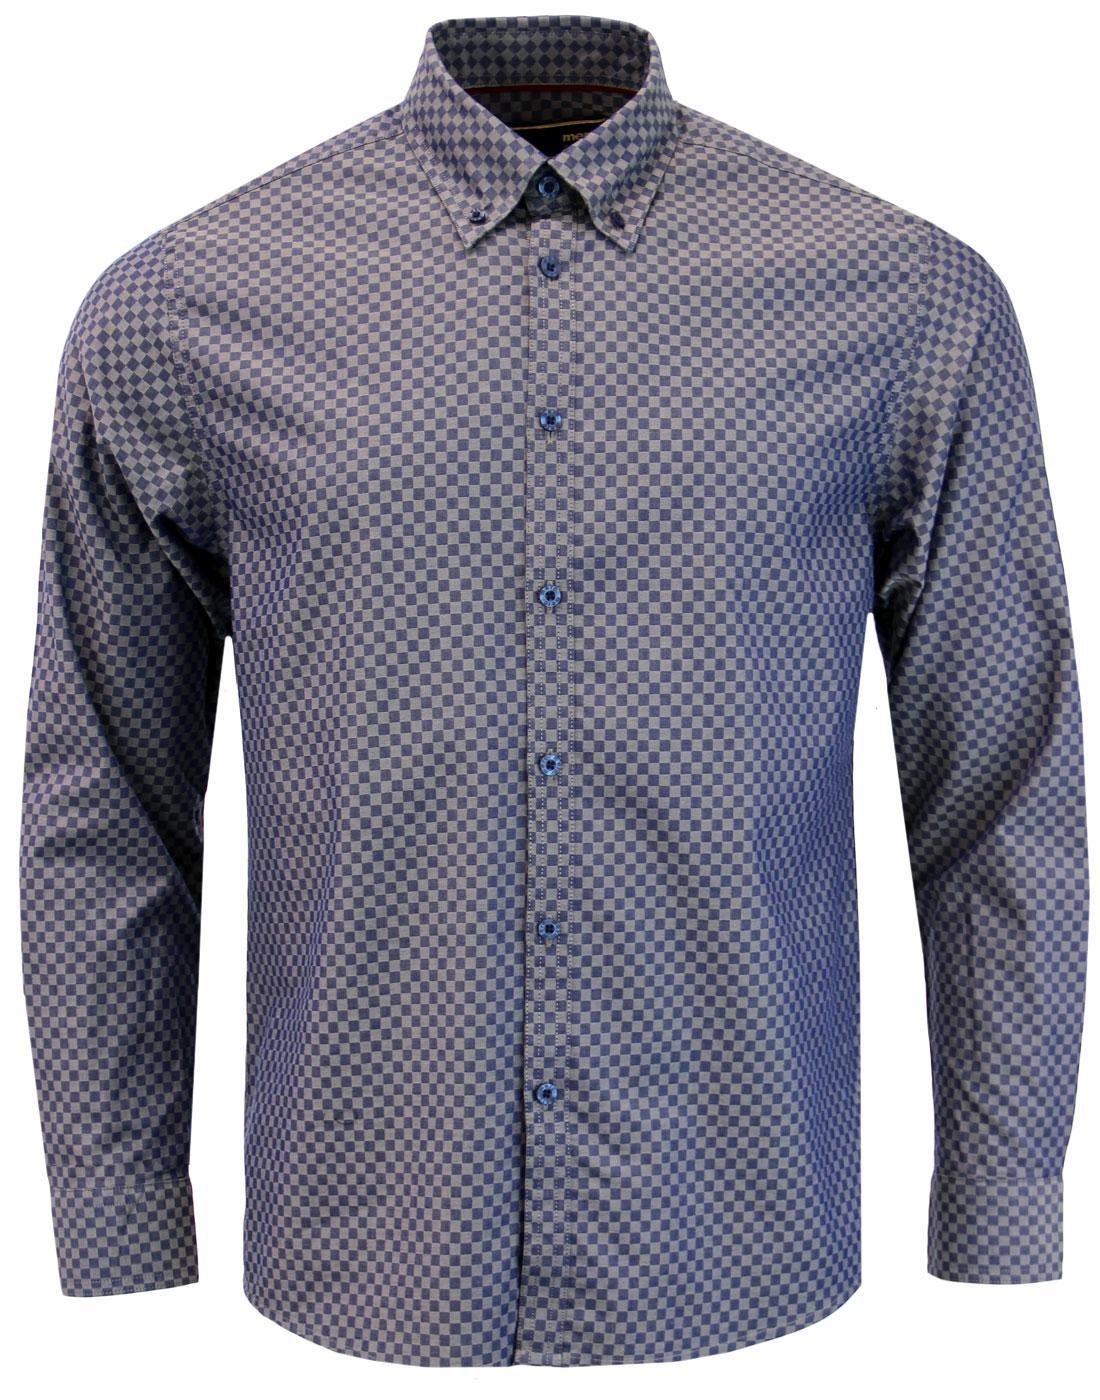 Coombe MERC Mod Ska Check Button Down Shirt (DB)